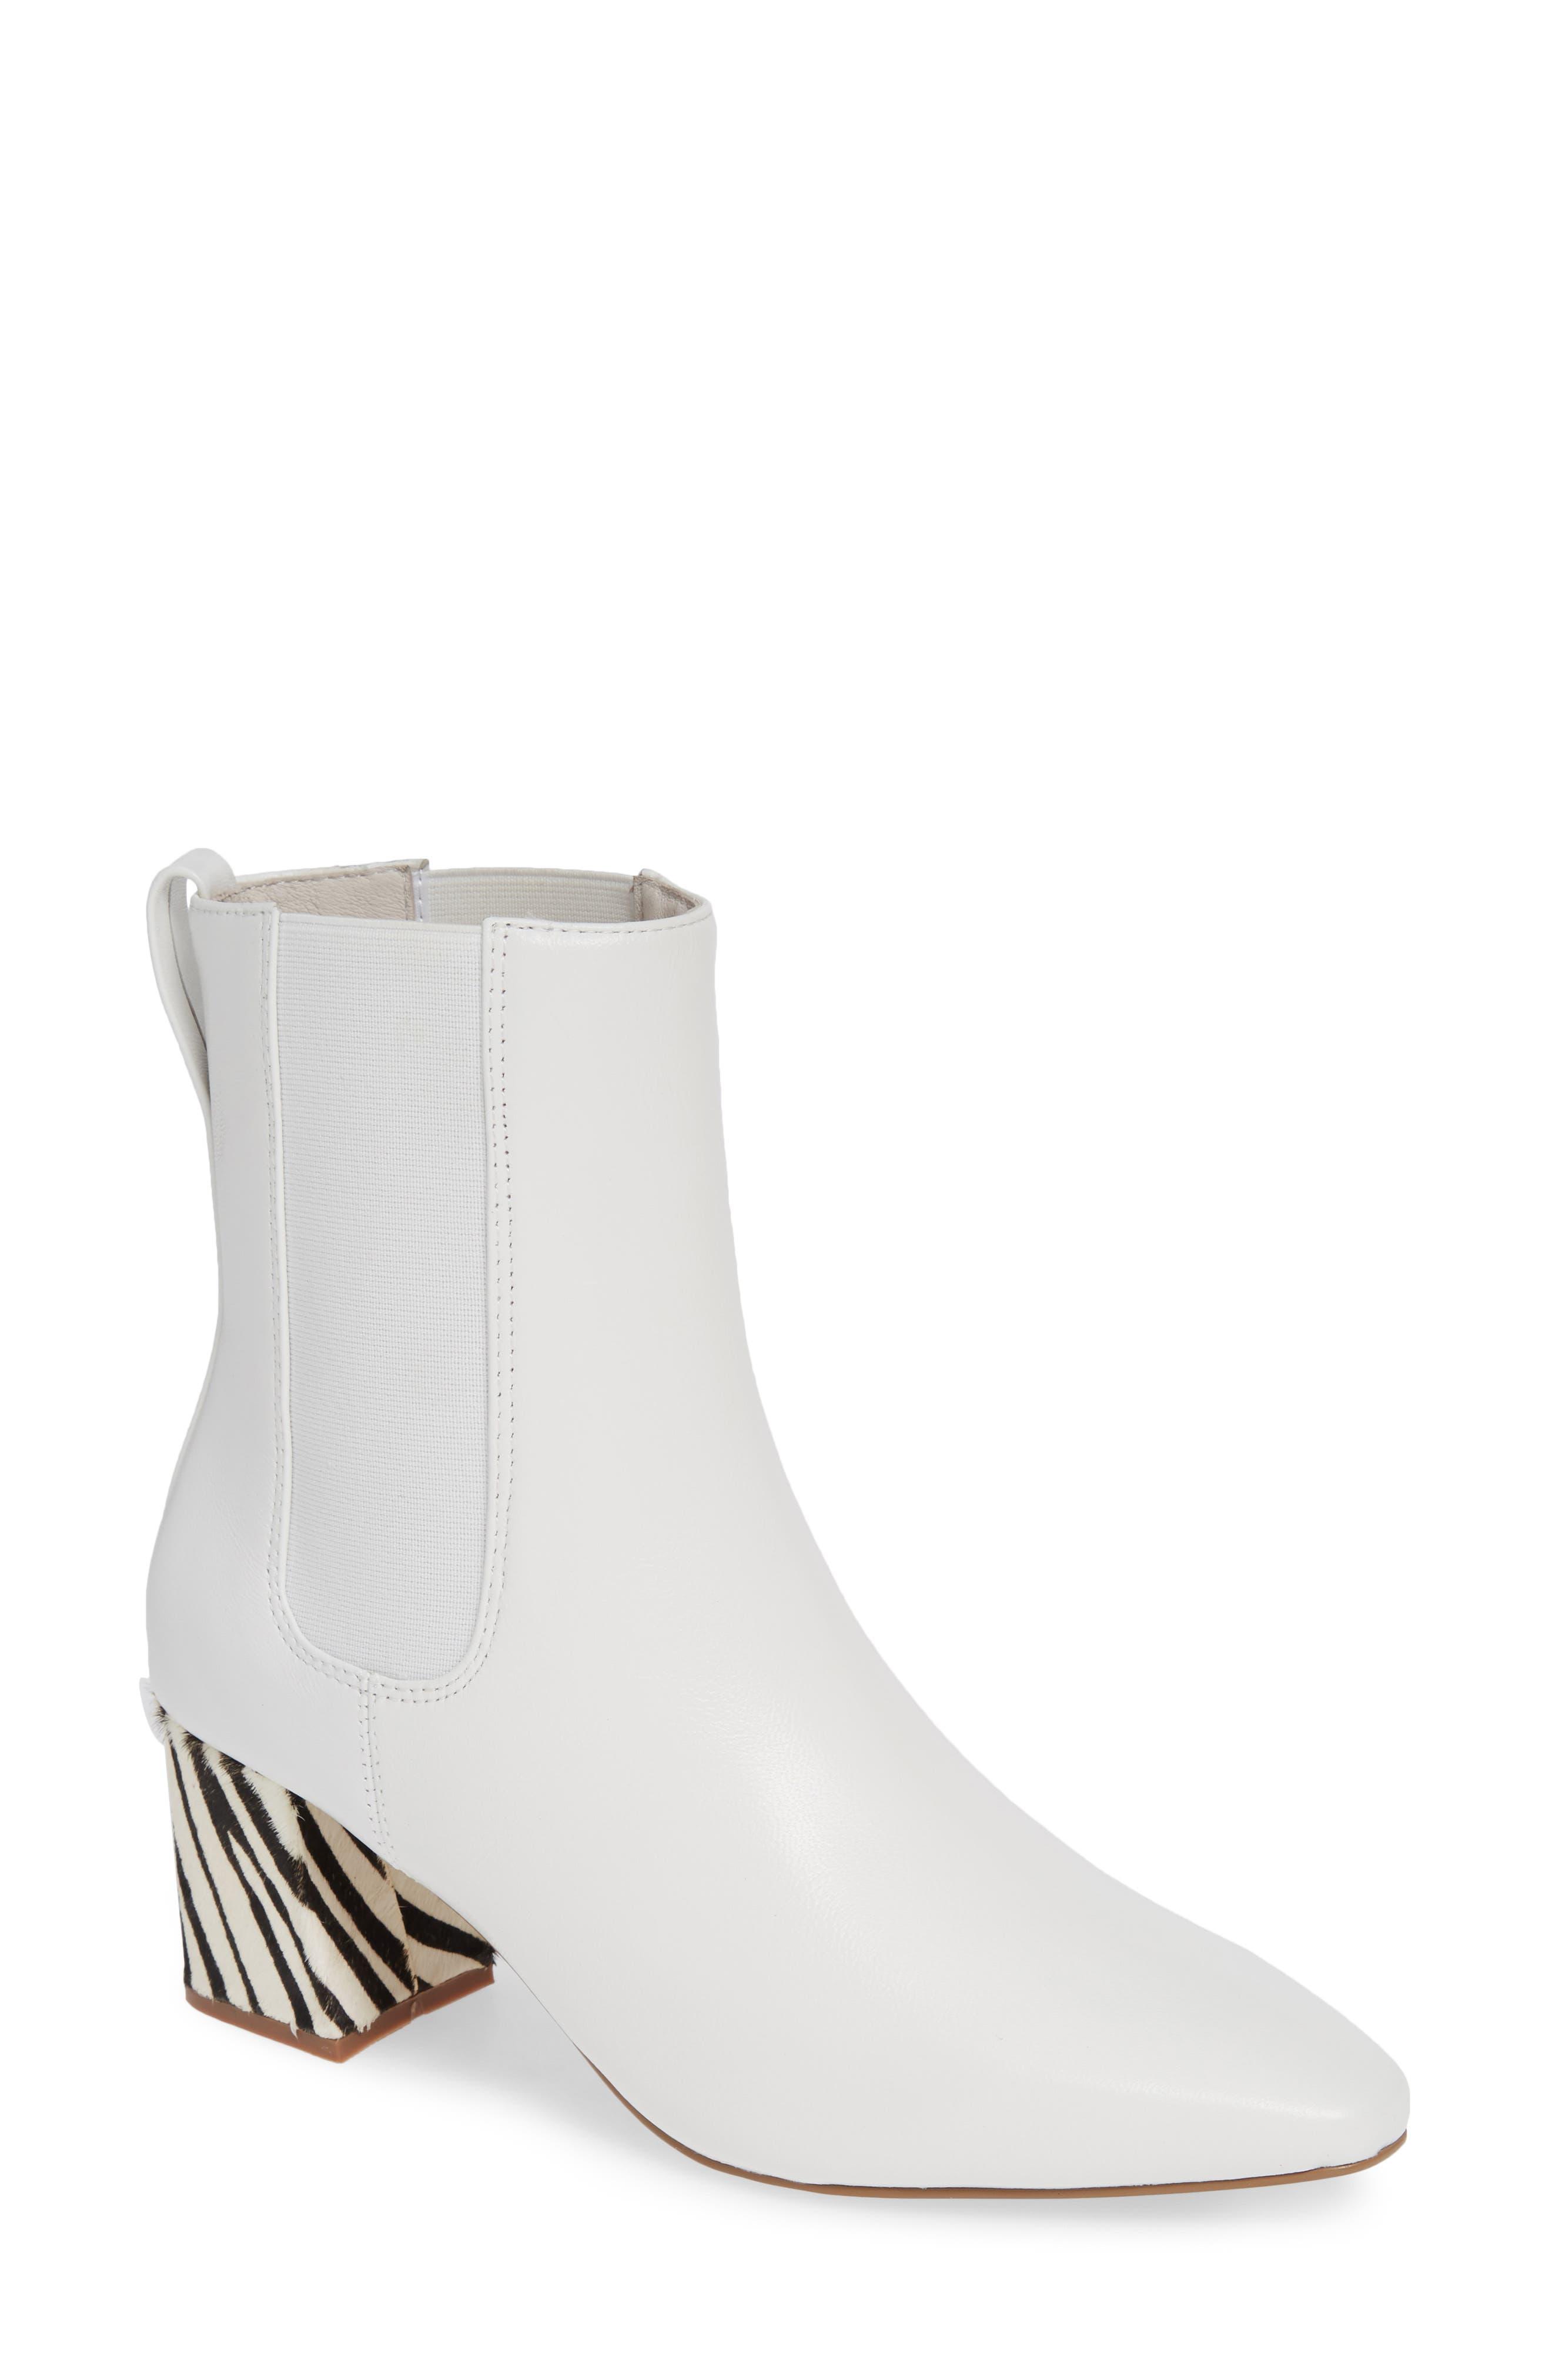 Matisse Off Duty Genuine Calf Hair Chelsea Bootie- White